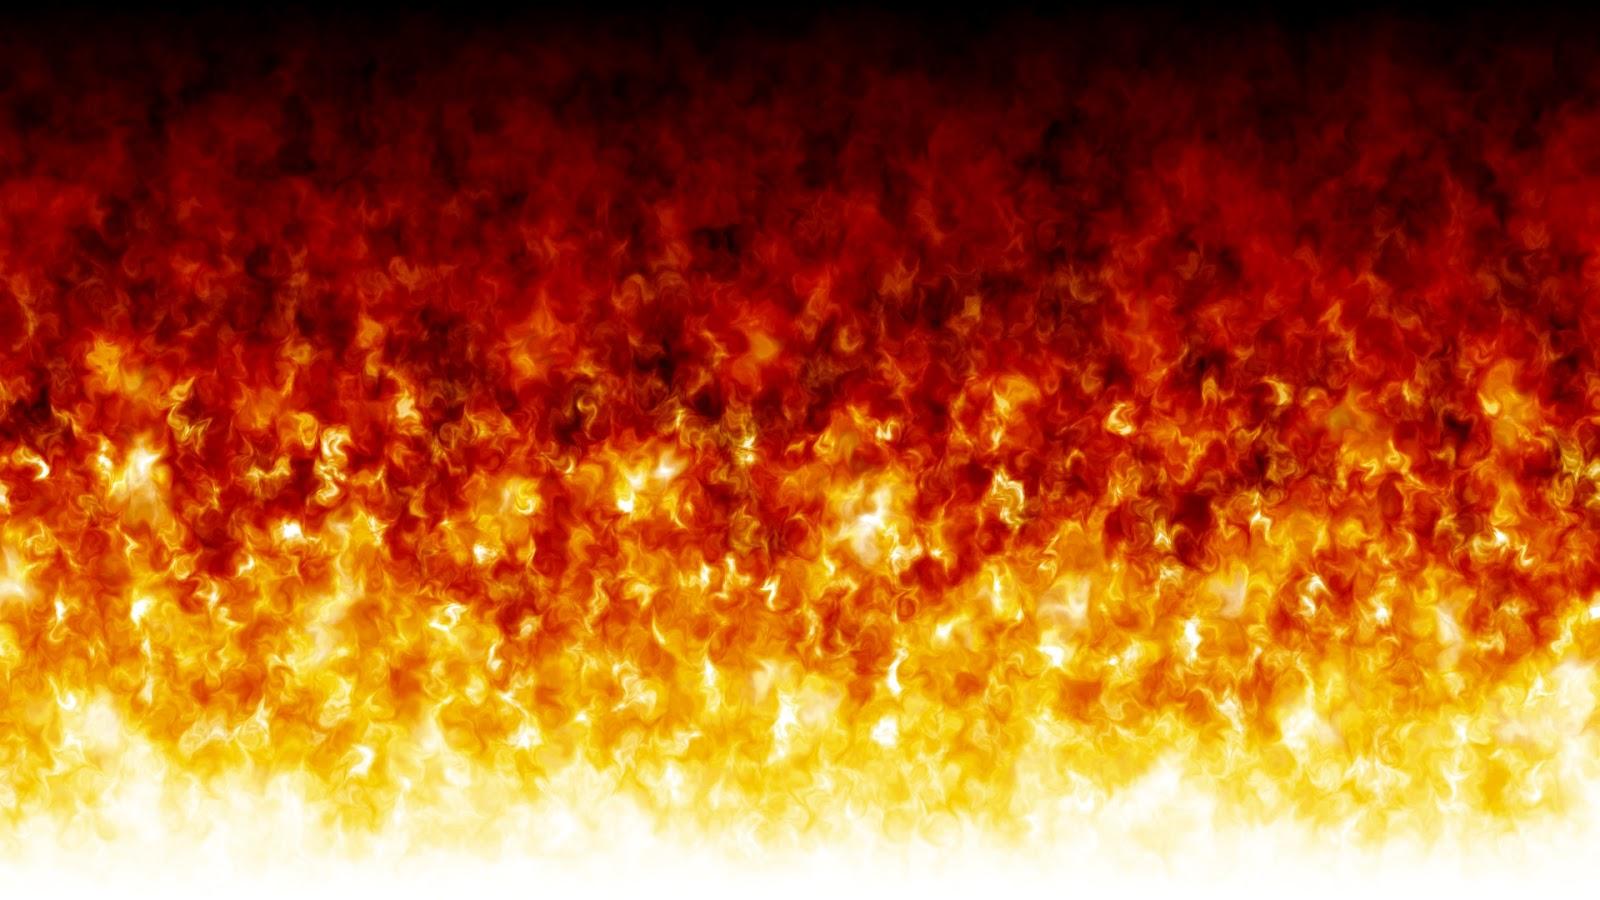 hd desktop wallpaper 1600x900   wwwhigh definition wallpapersinfo 1600x900